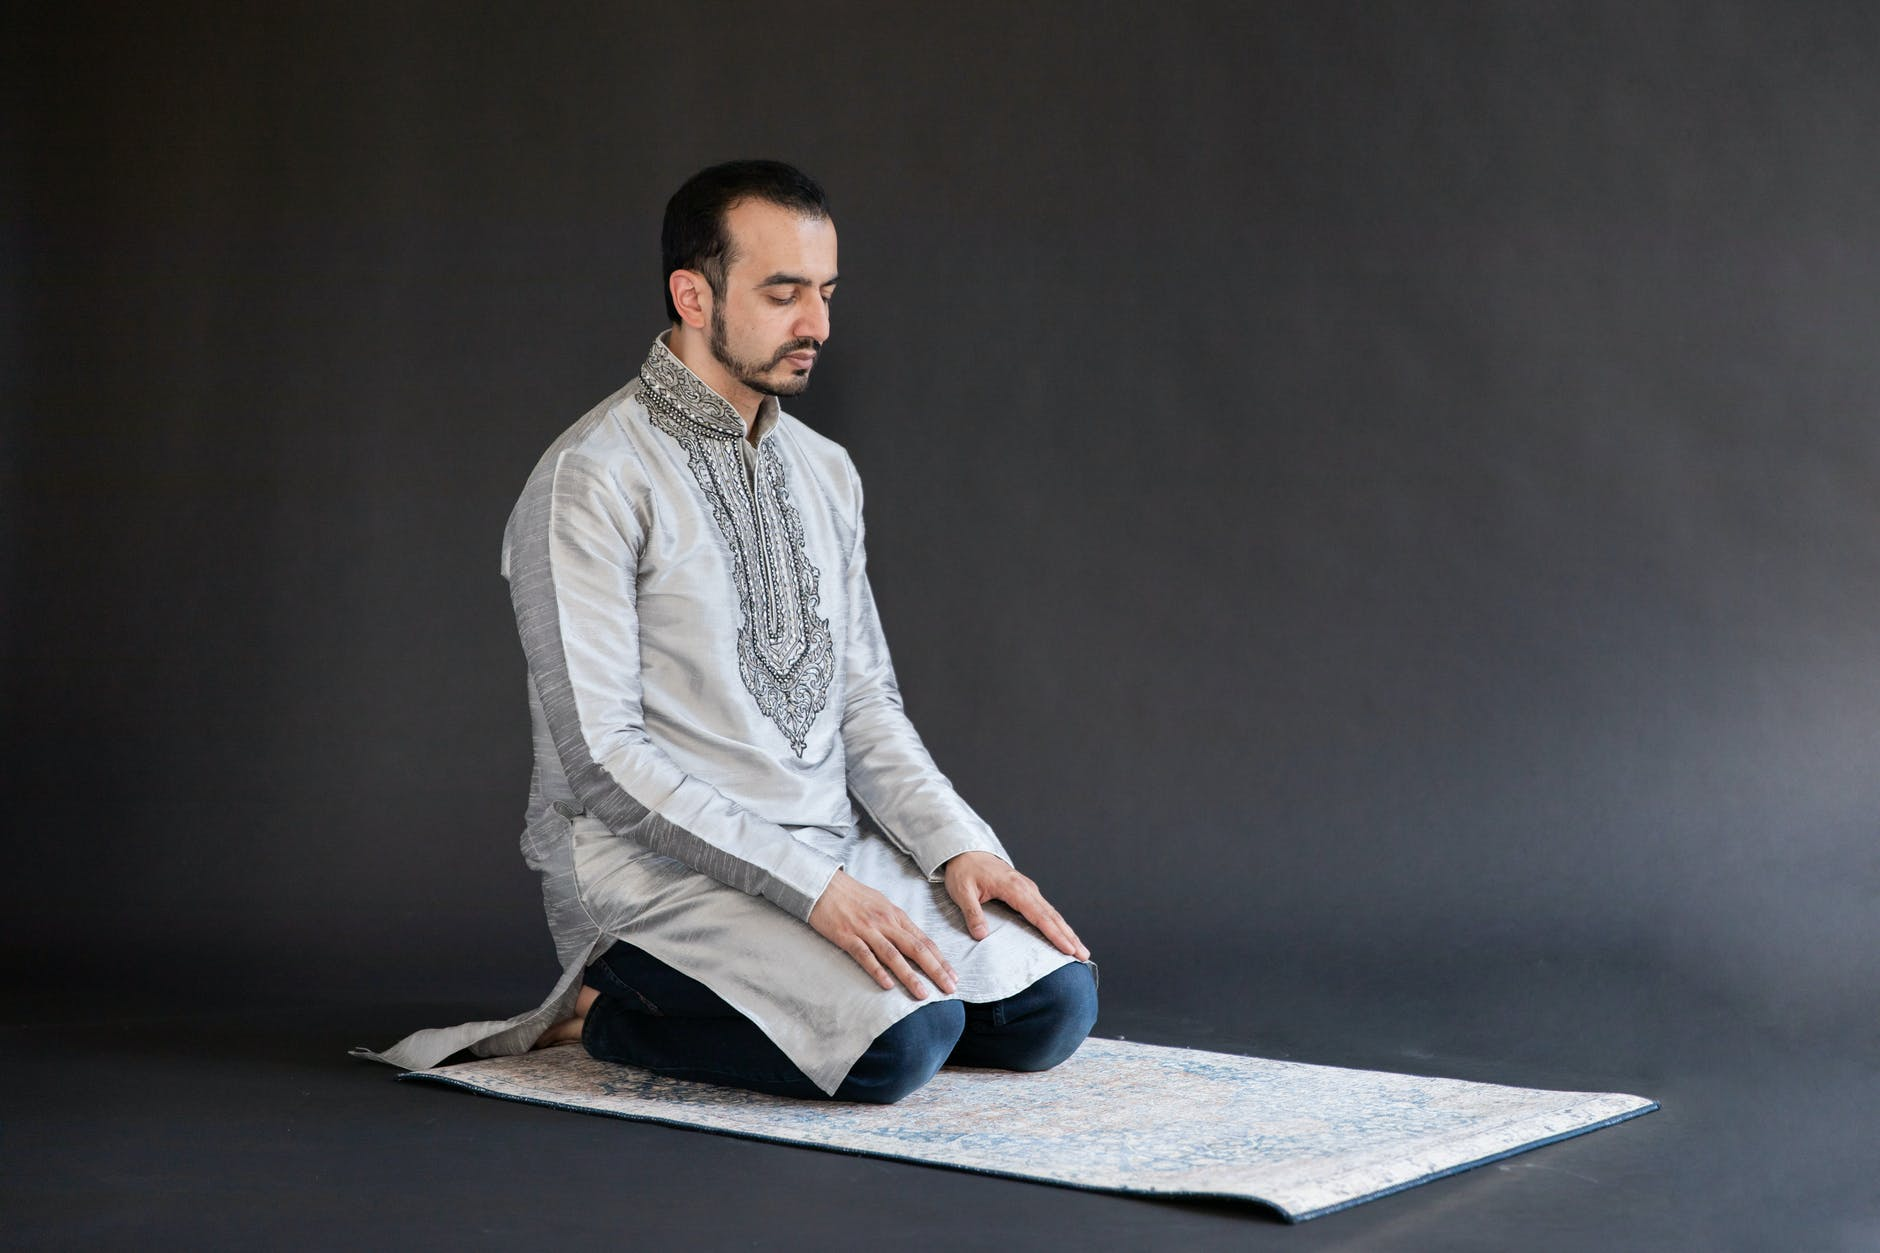 man kneeling on a carpet